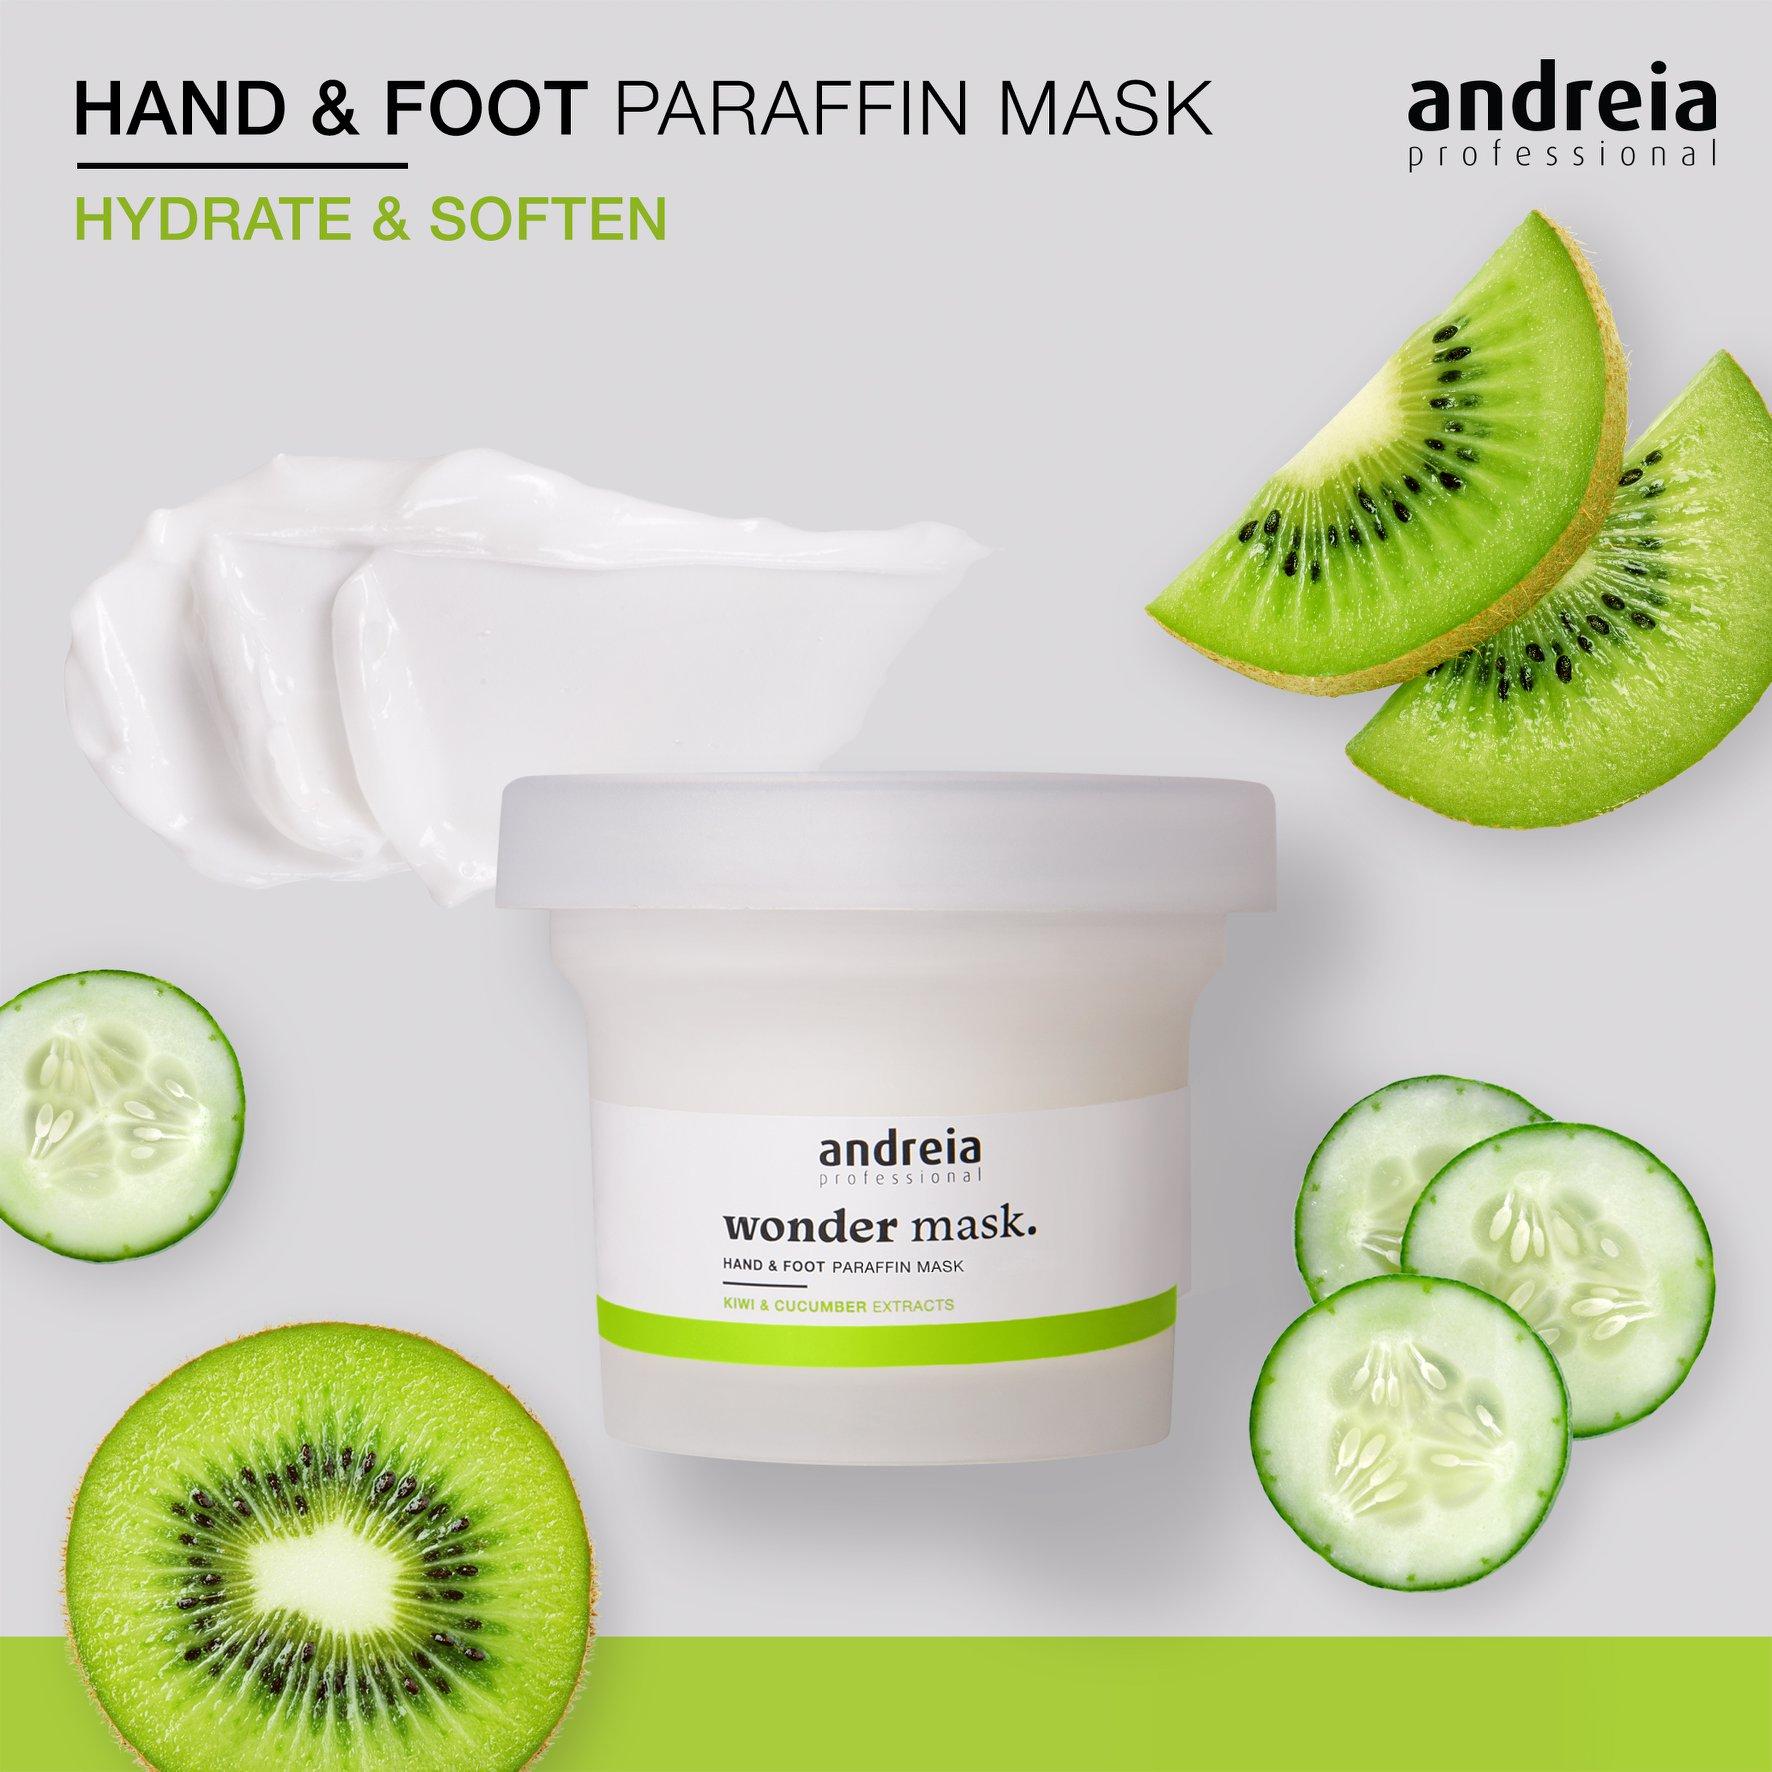 Wonder Mask Andreia - Máscara de parafina para mãos e pés 200ml